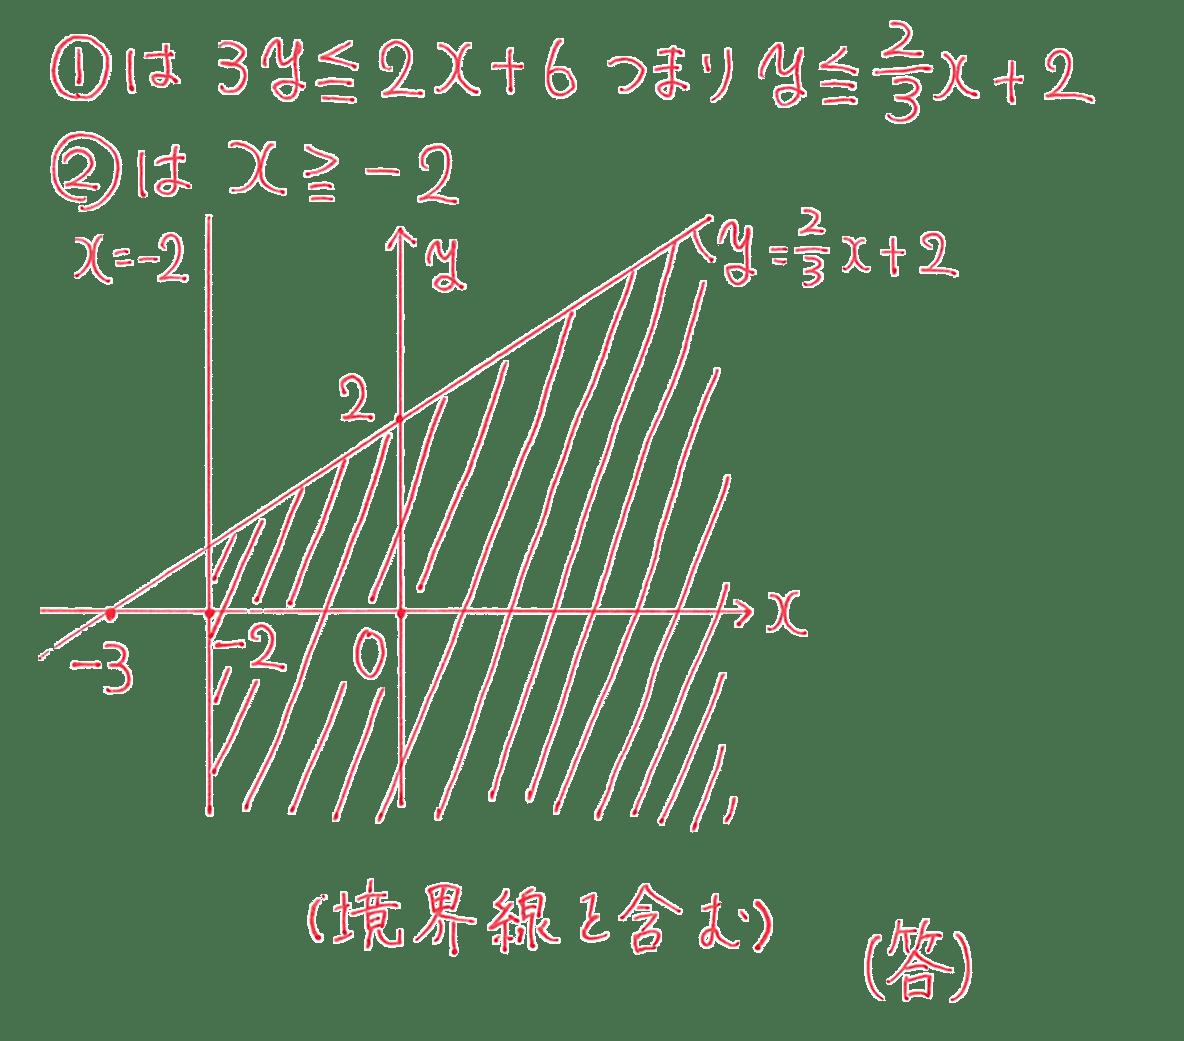 高校数学Ⅱ 図形と方程式31 練習 答え